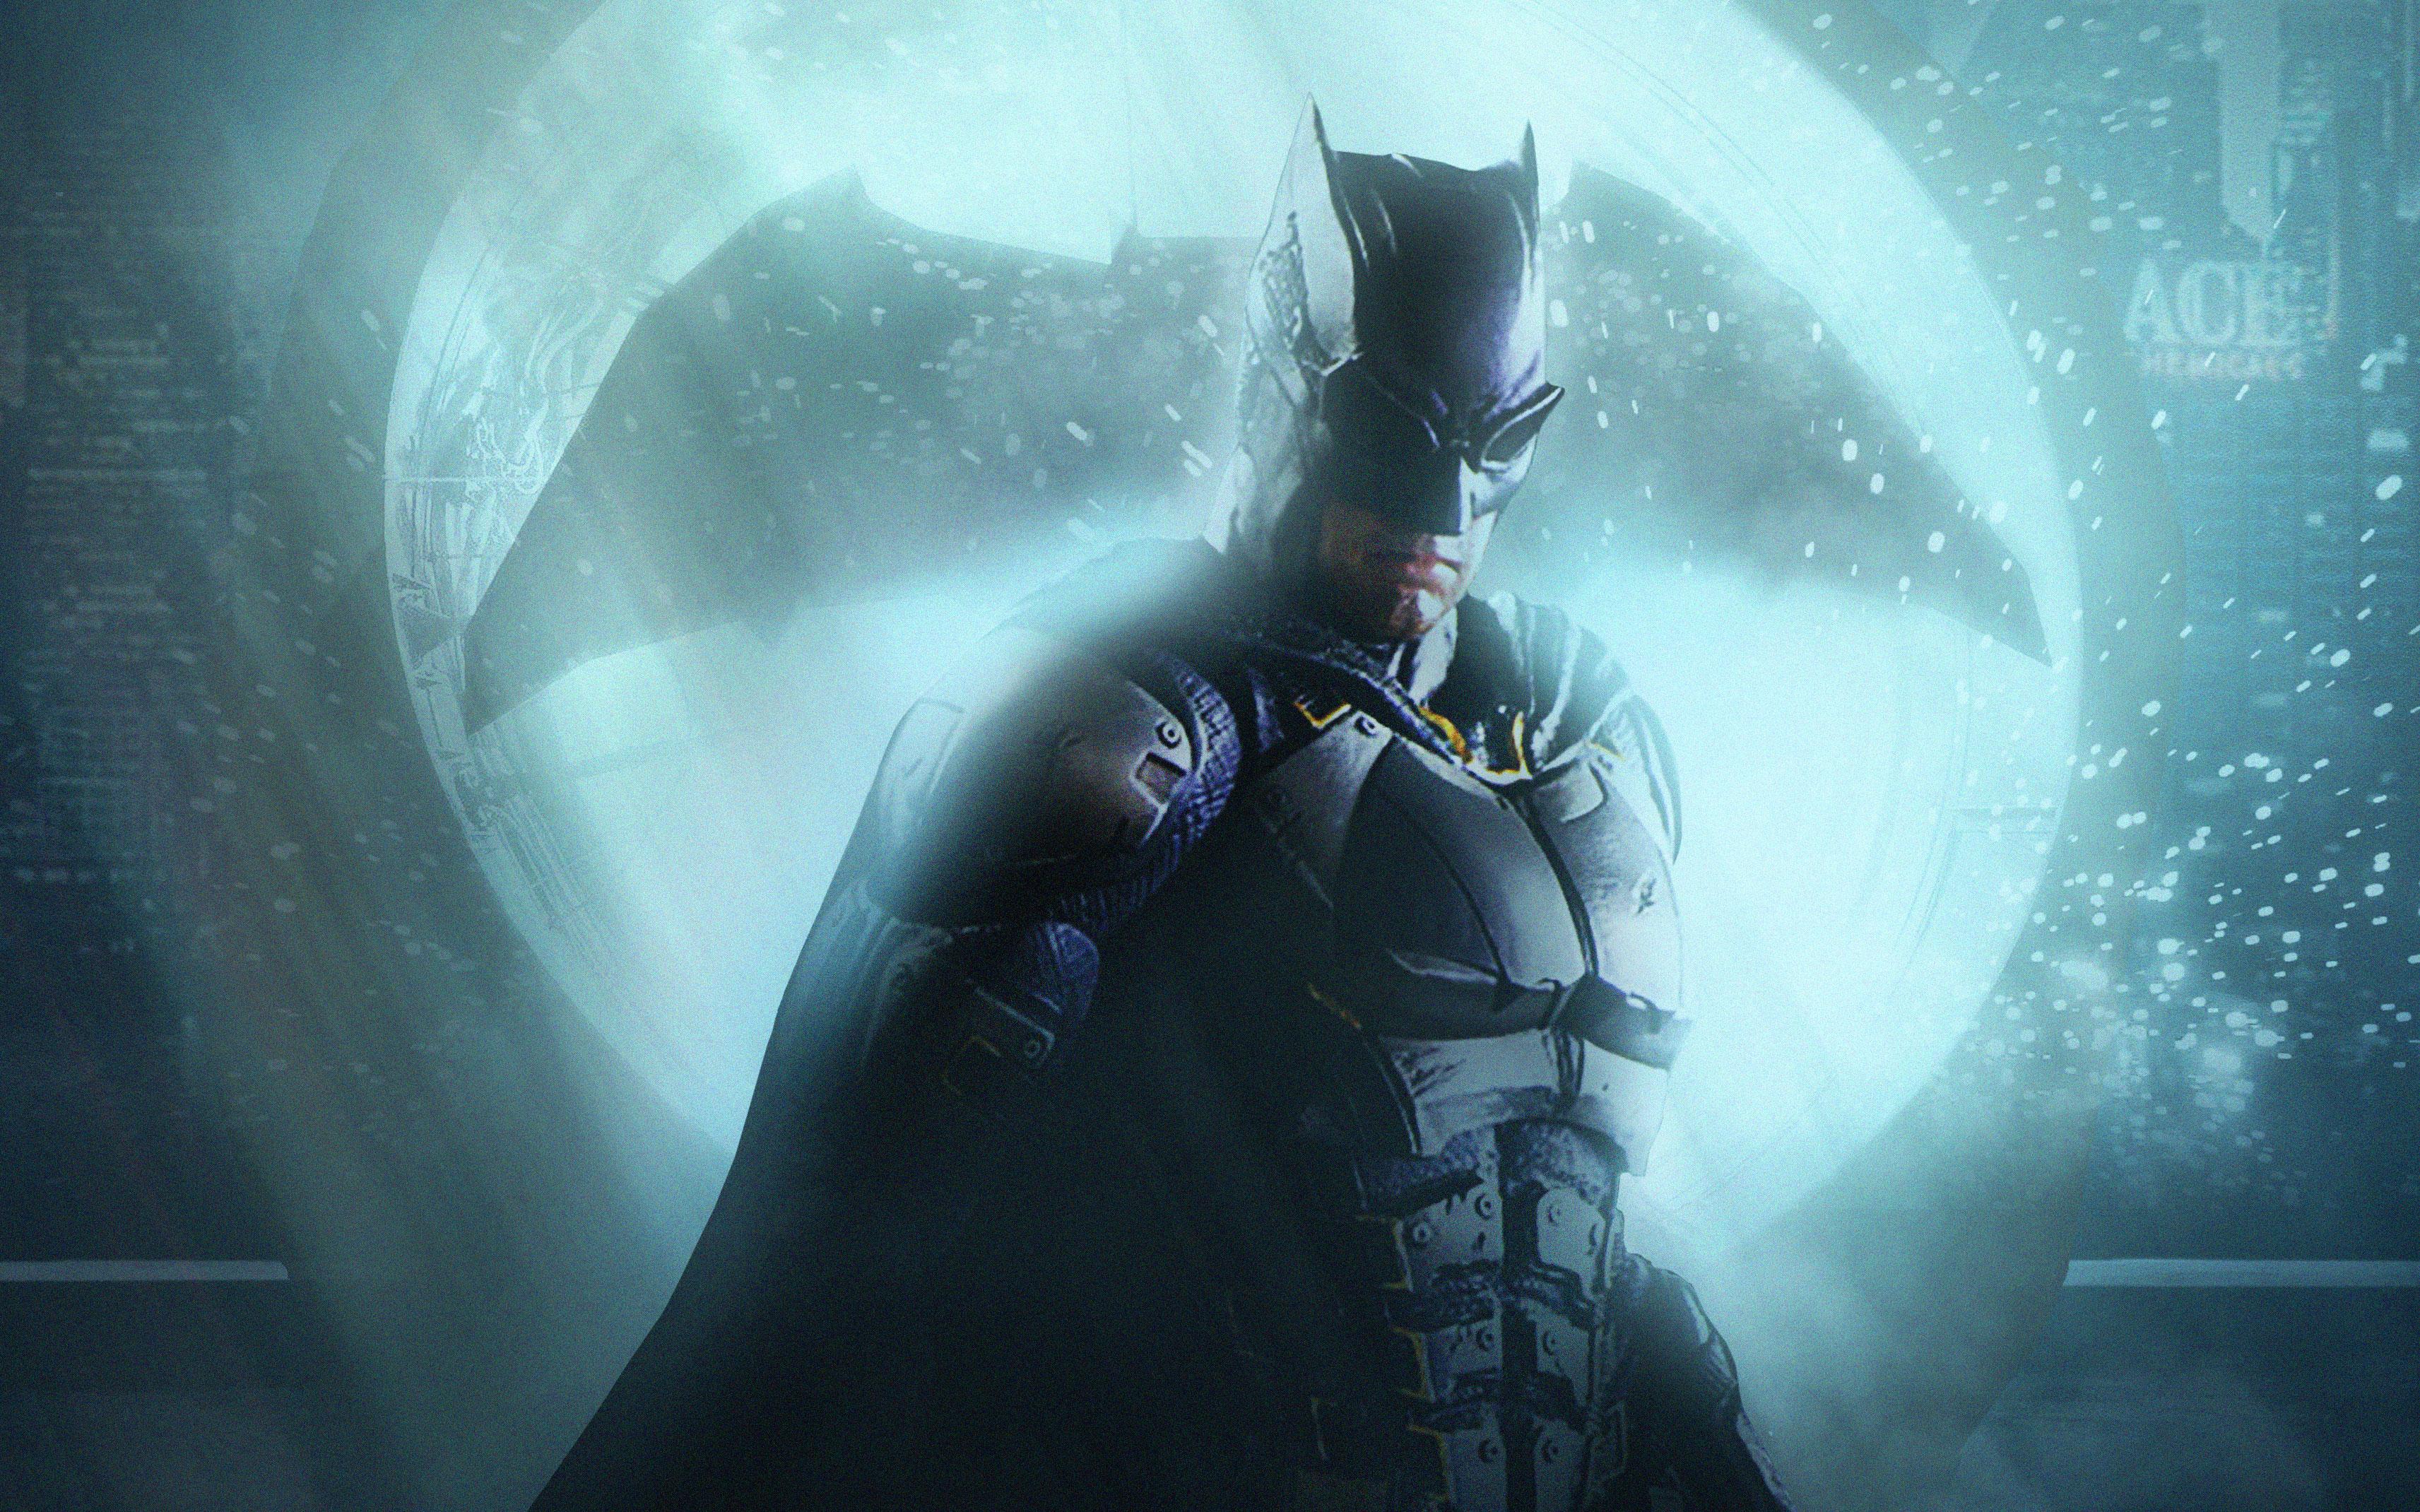 Justice League 2017 Movie 4k Hd Desktop Wallpaper For 4k: Batman Justice League 4k Art, HD Movies, 4k Wallpapers